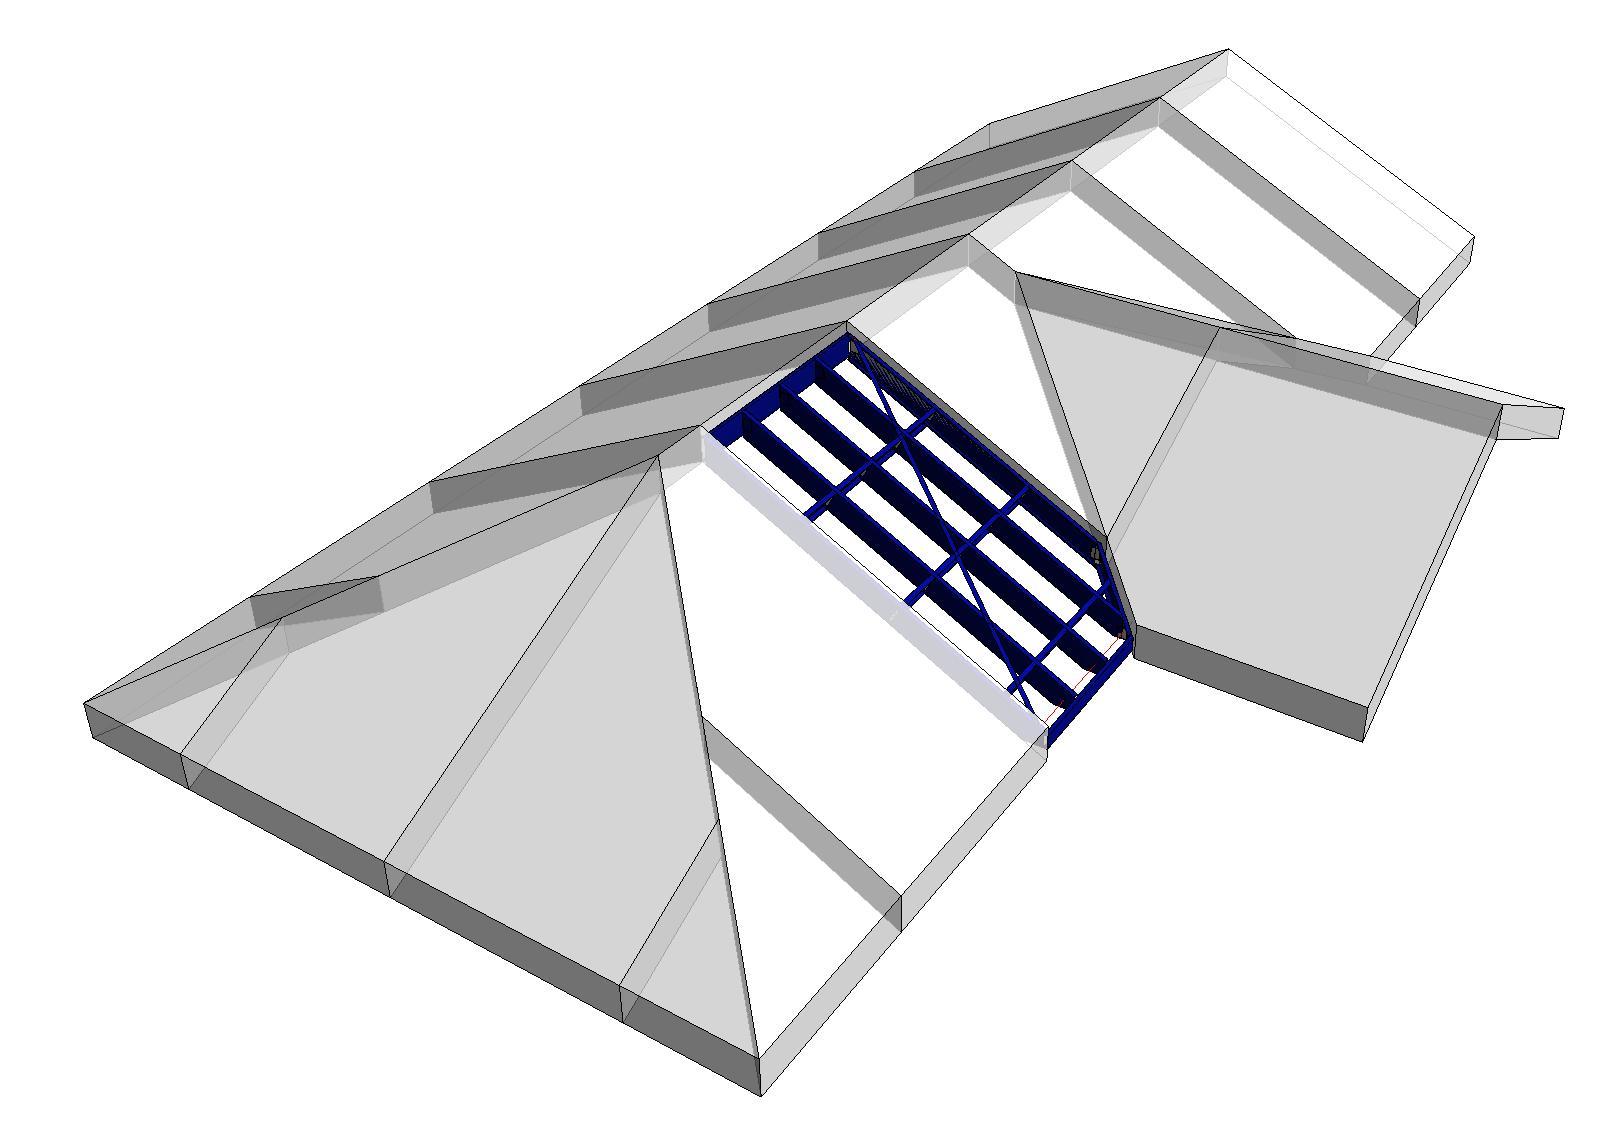 Metal Framing Roof+ | AGACAD TOOLS4BIM